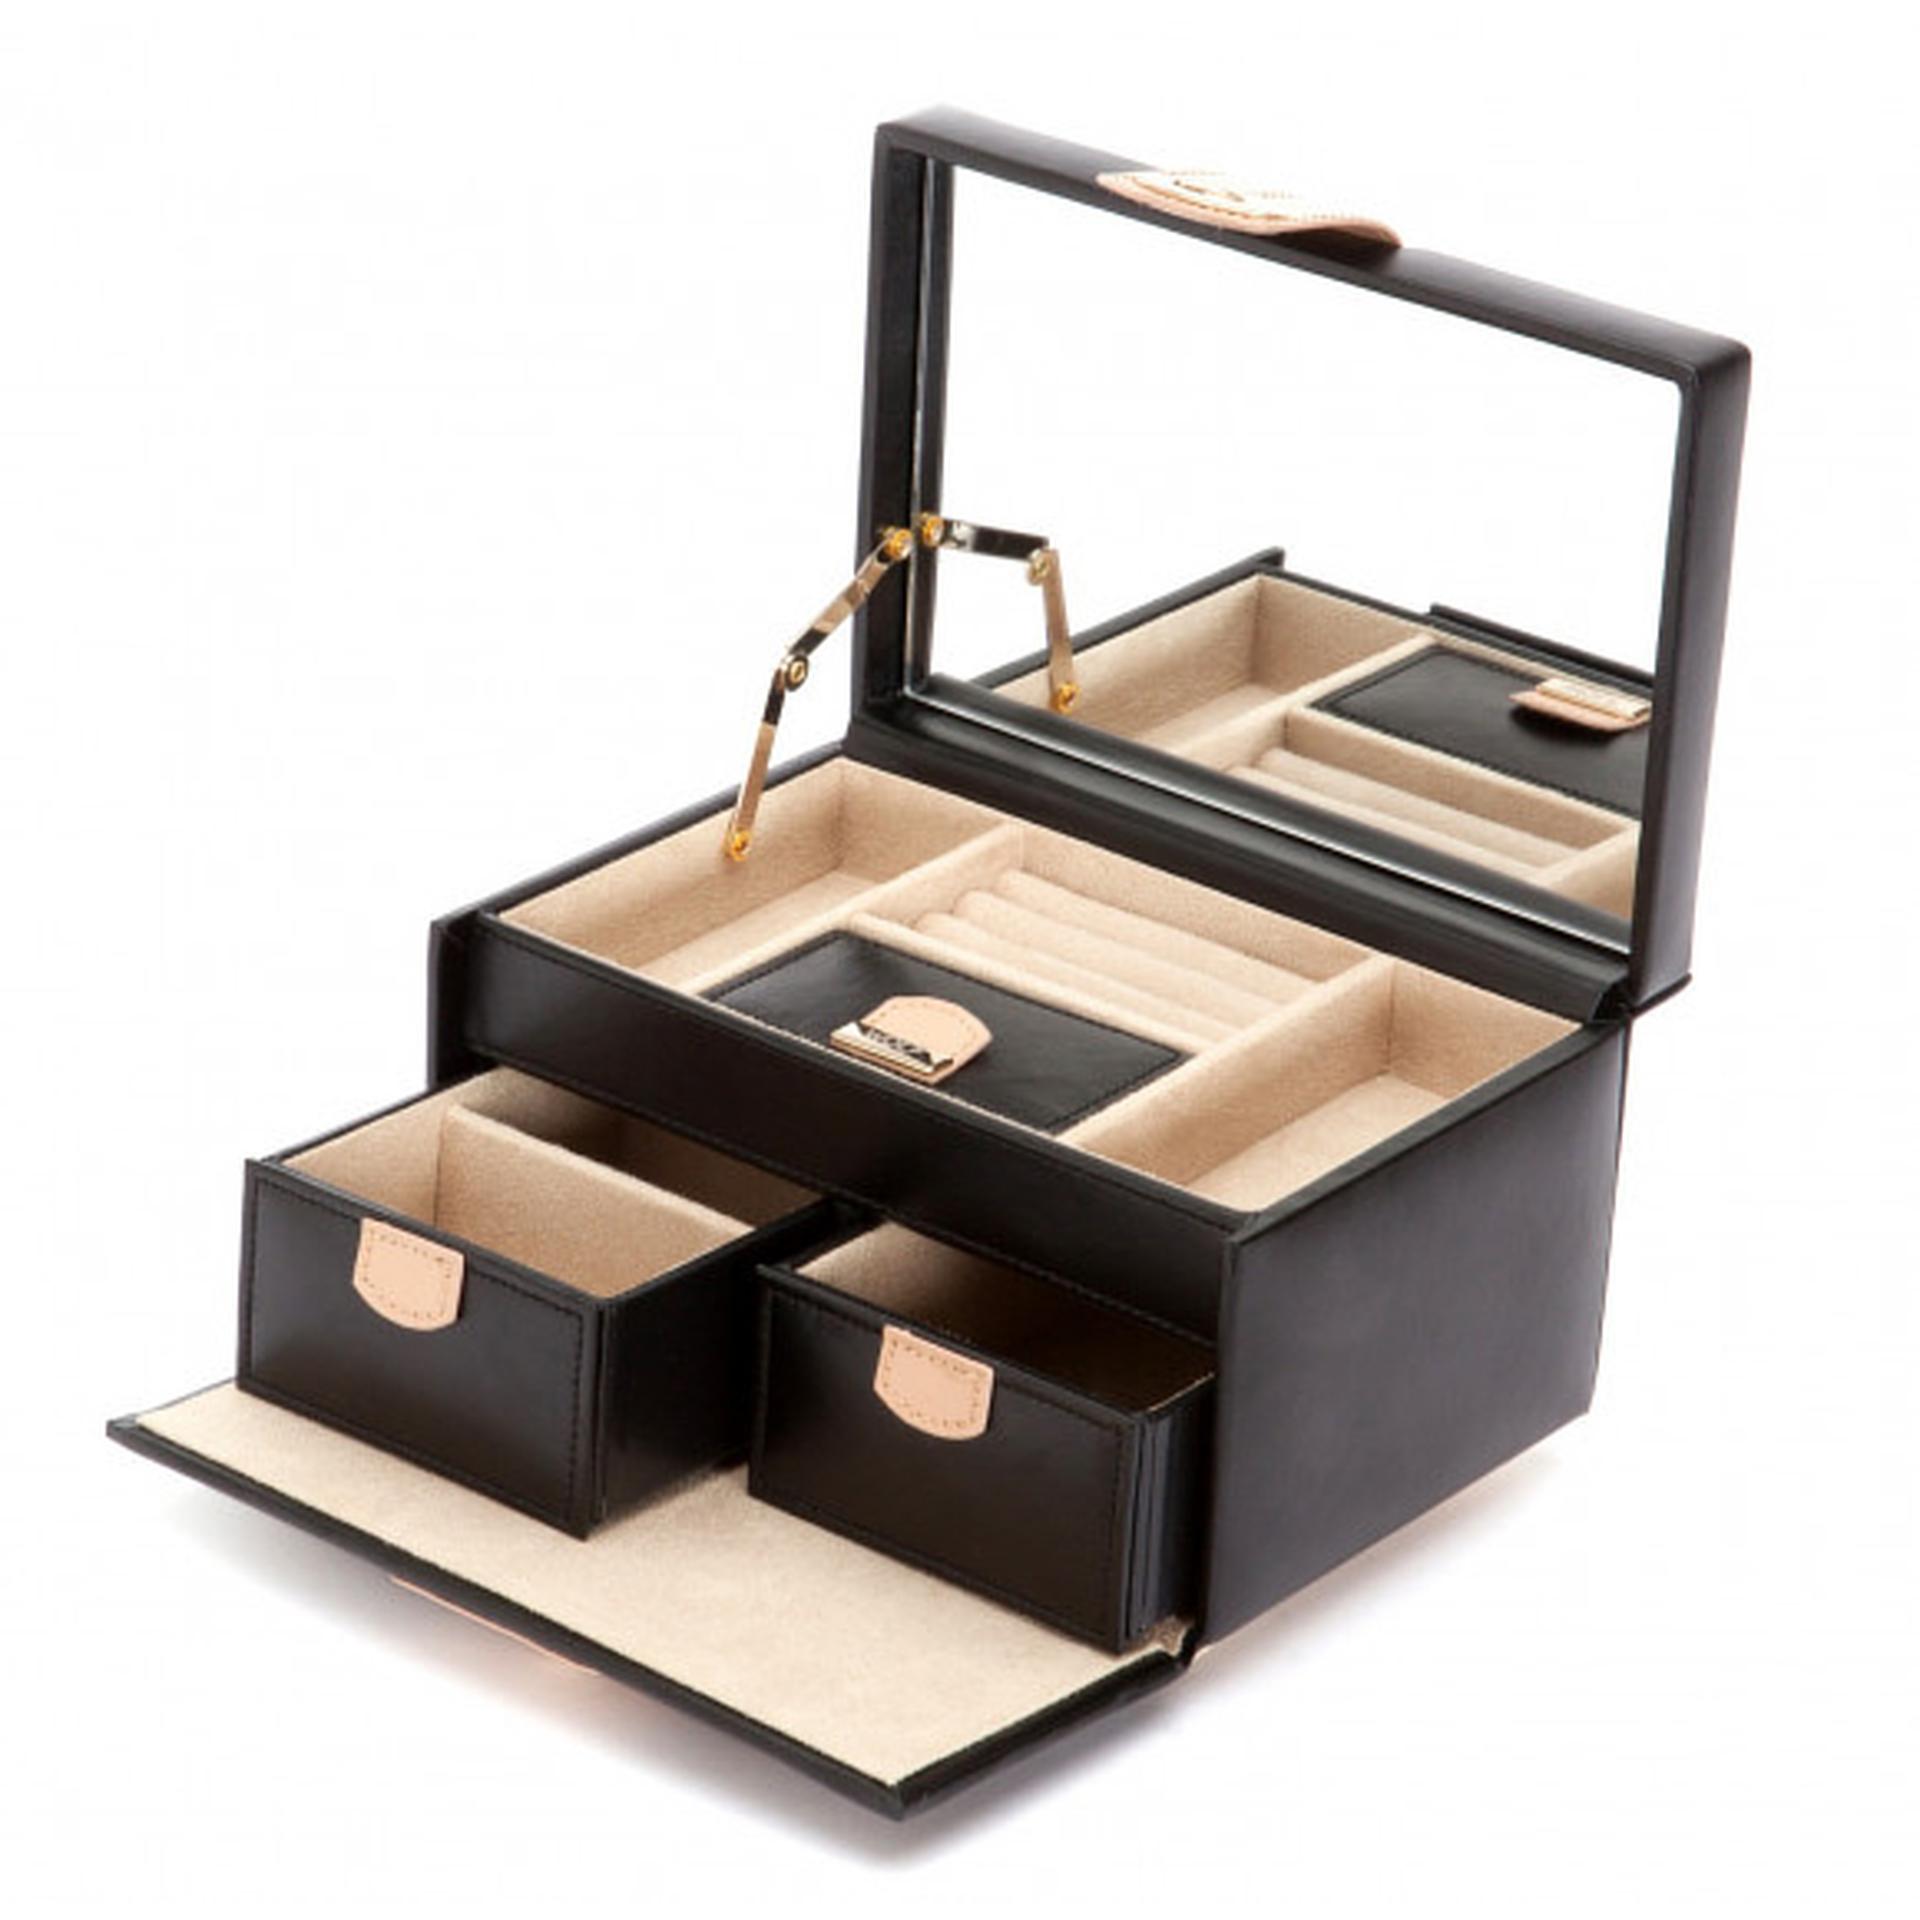 Chloe Black Small Jewellery Box